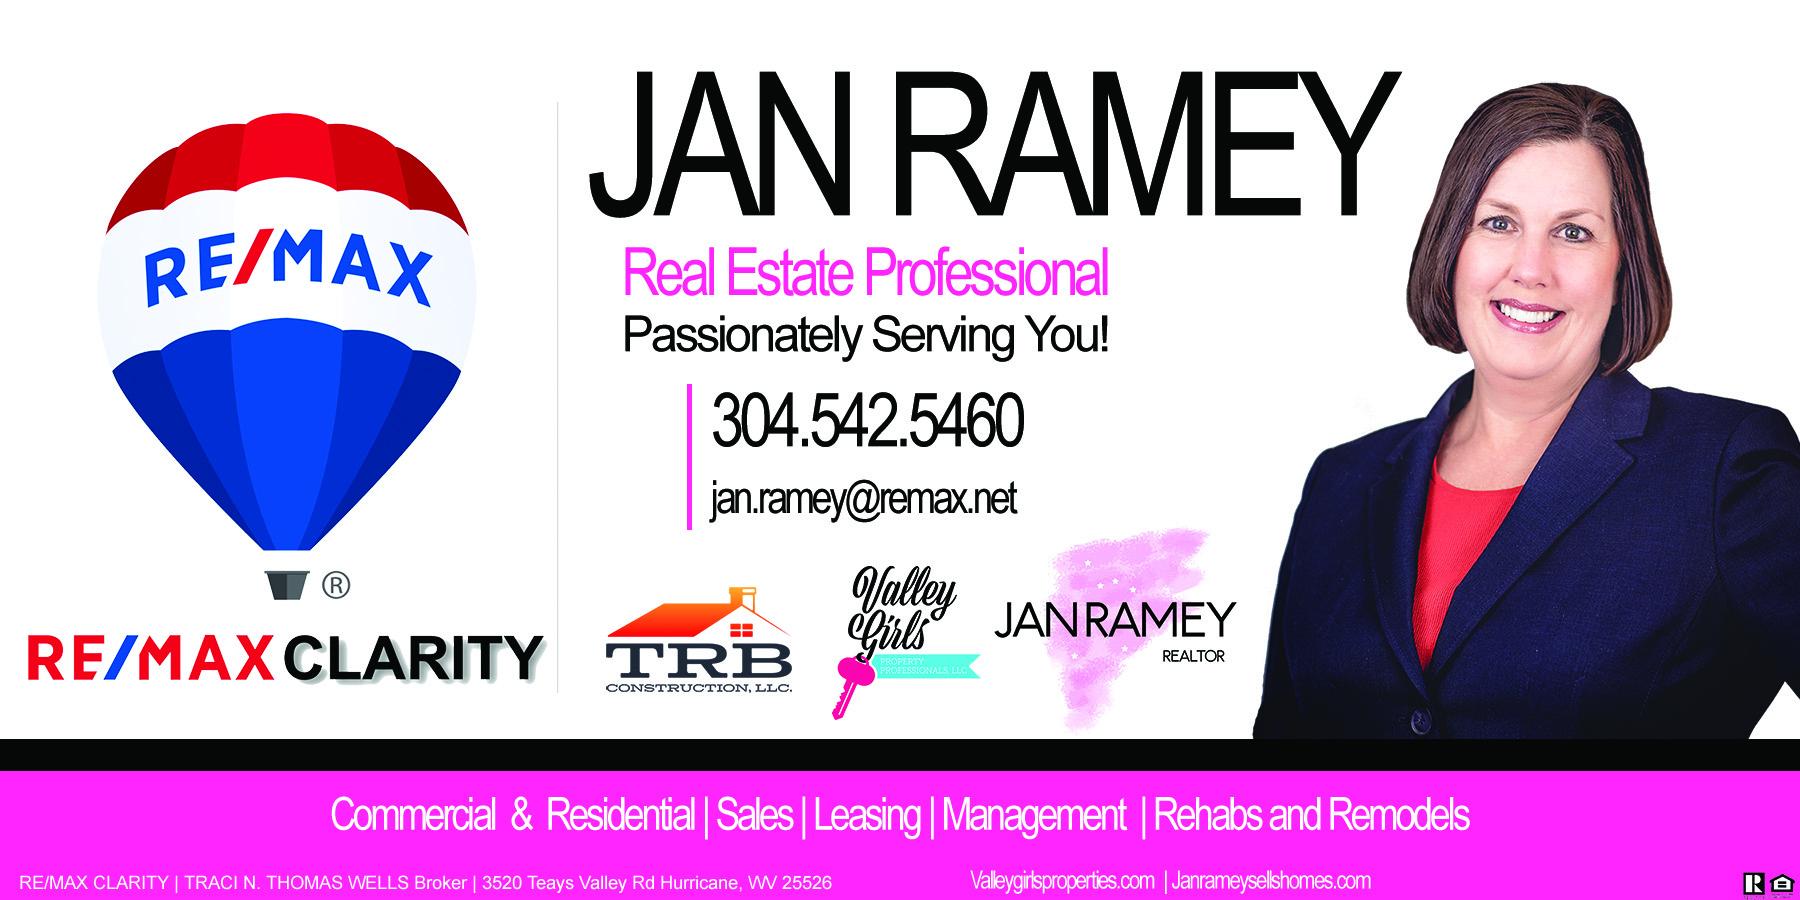 Email Signature Jan Ramey Remax.jpg